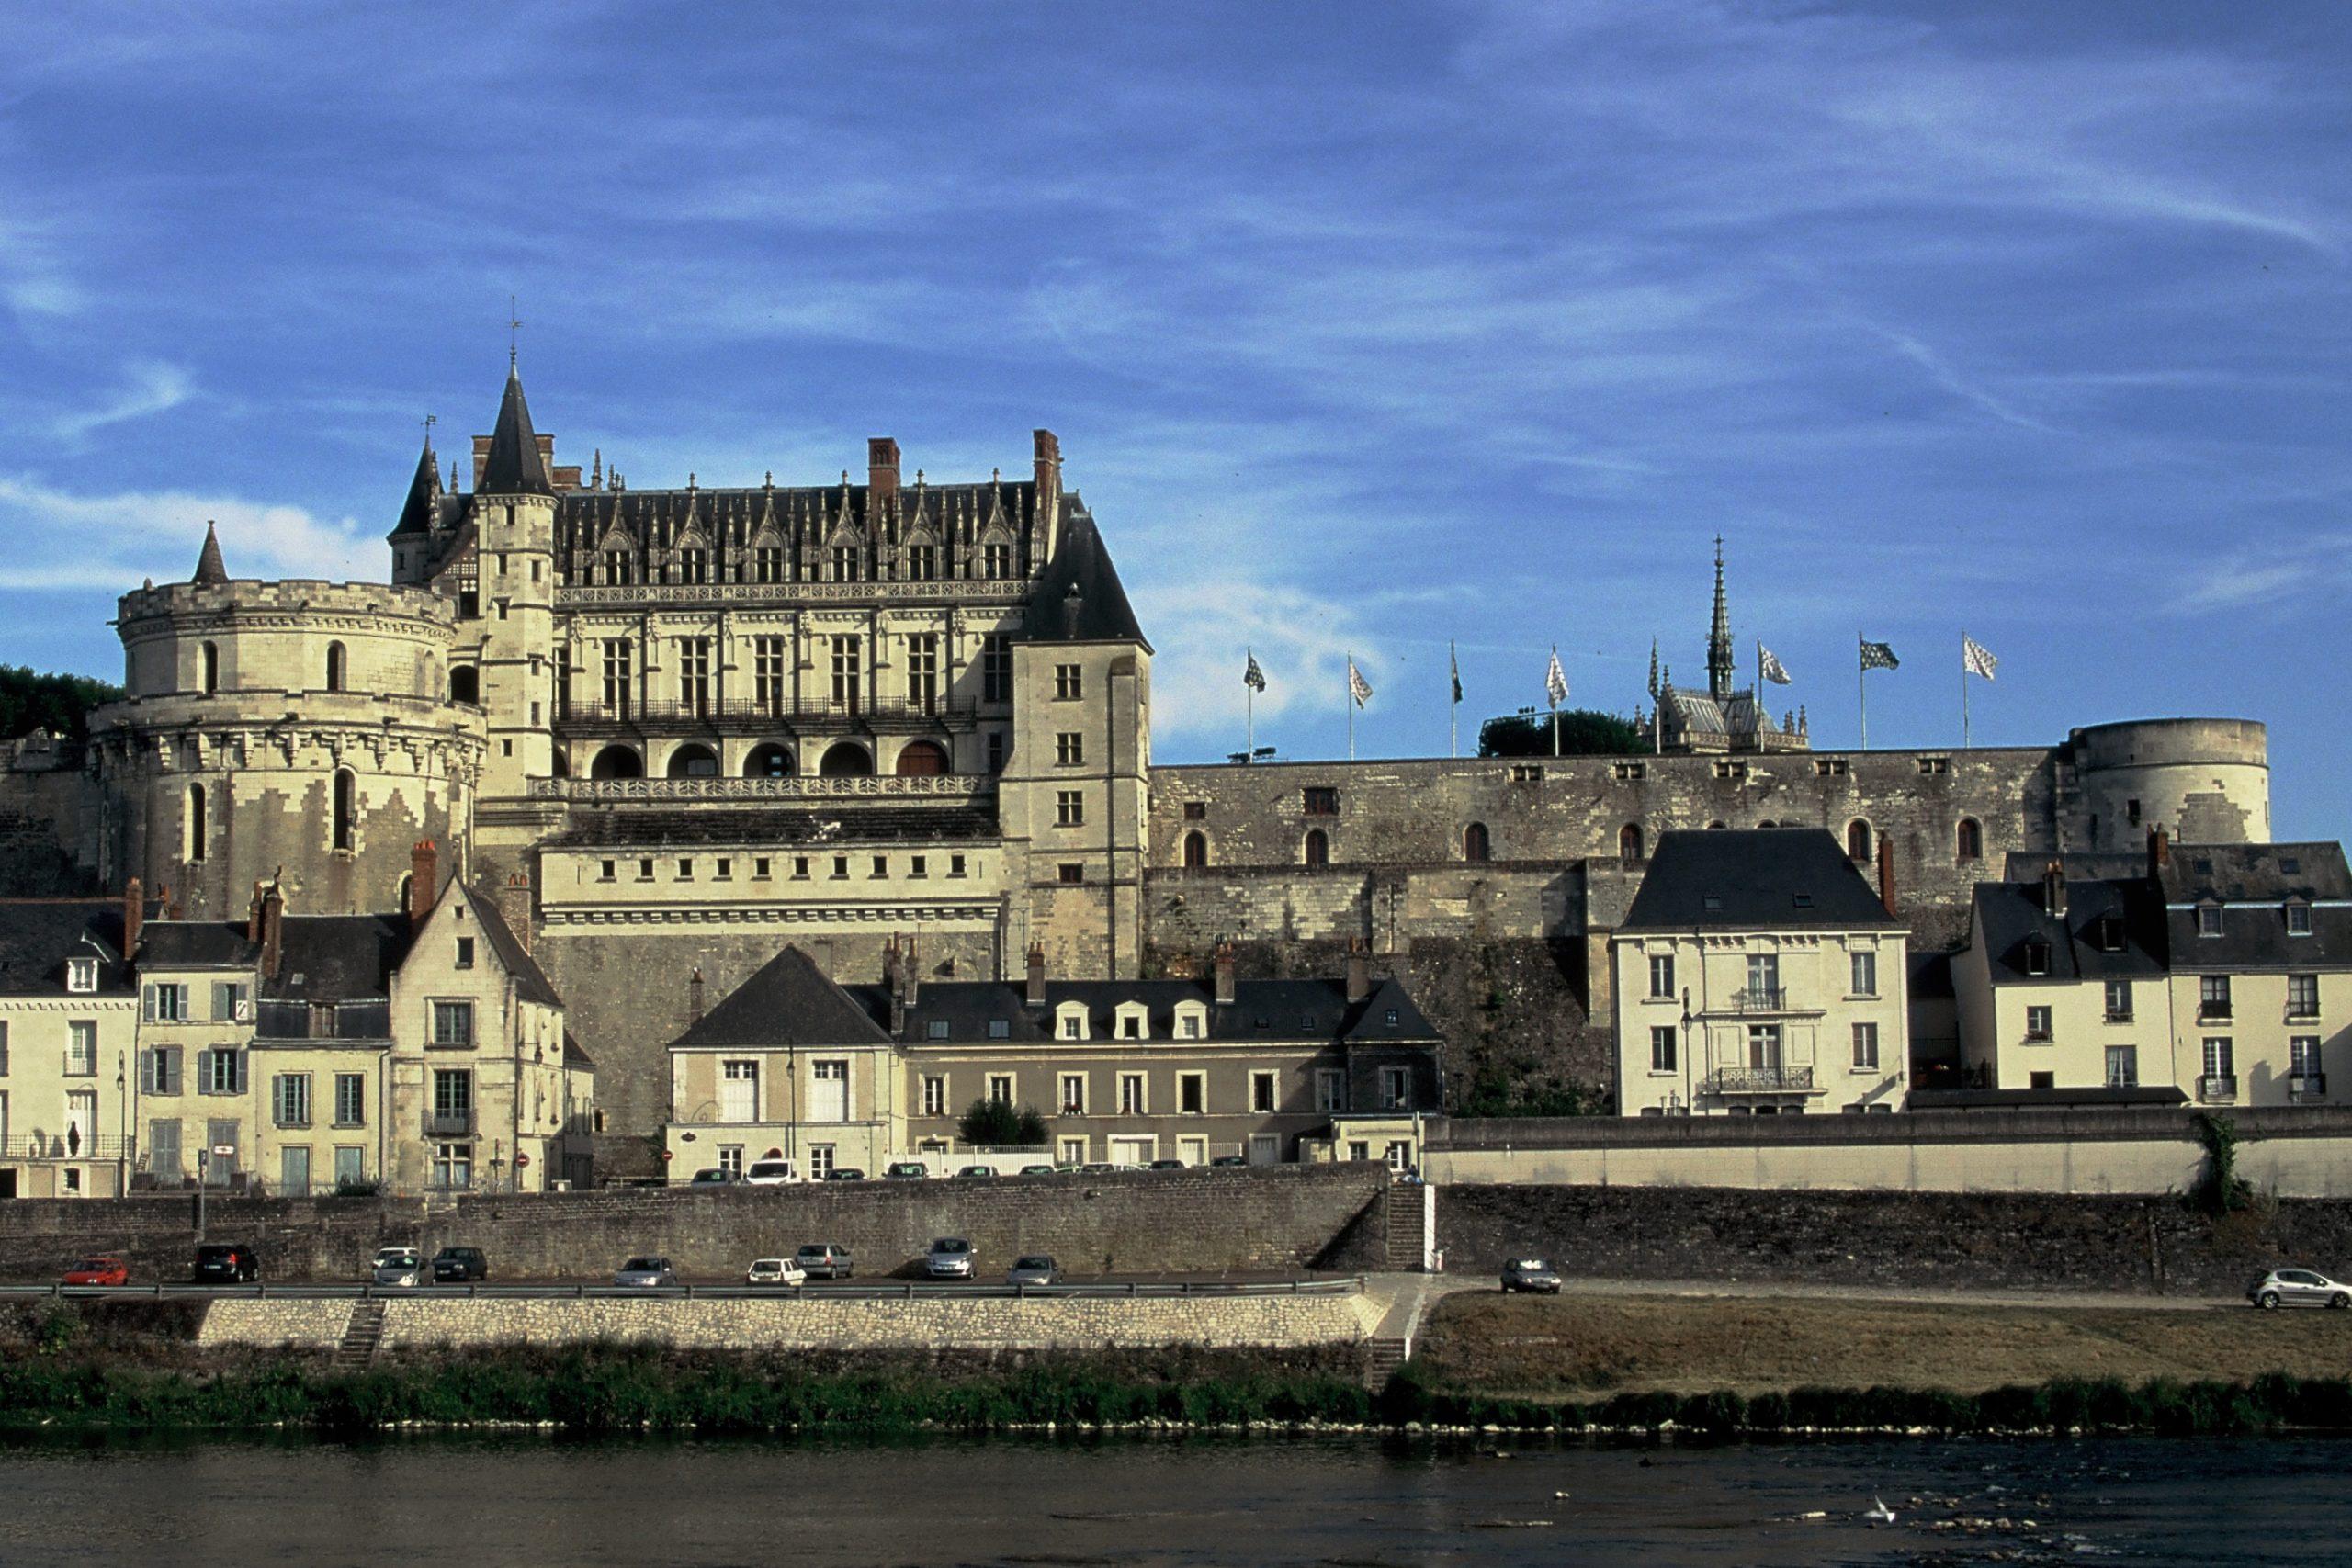 Chateau_damboise_depuis_lile